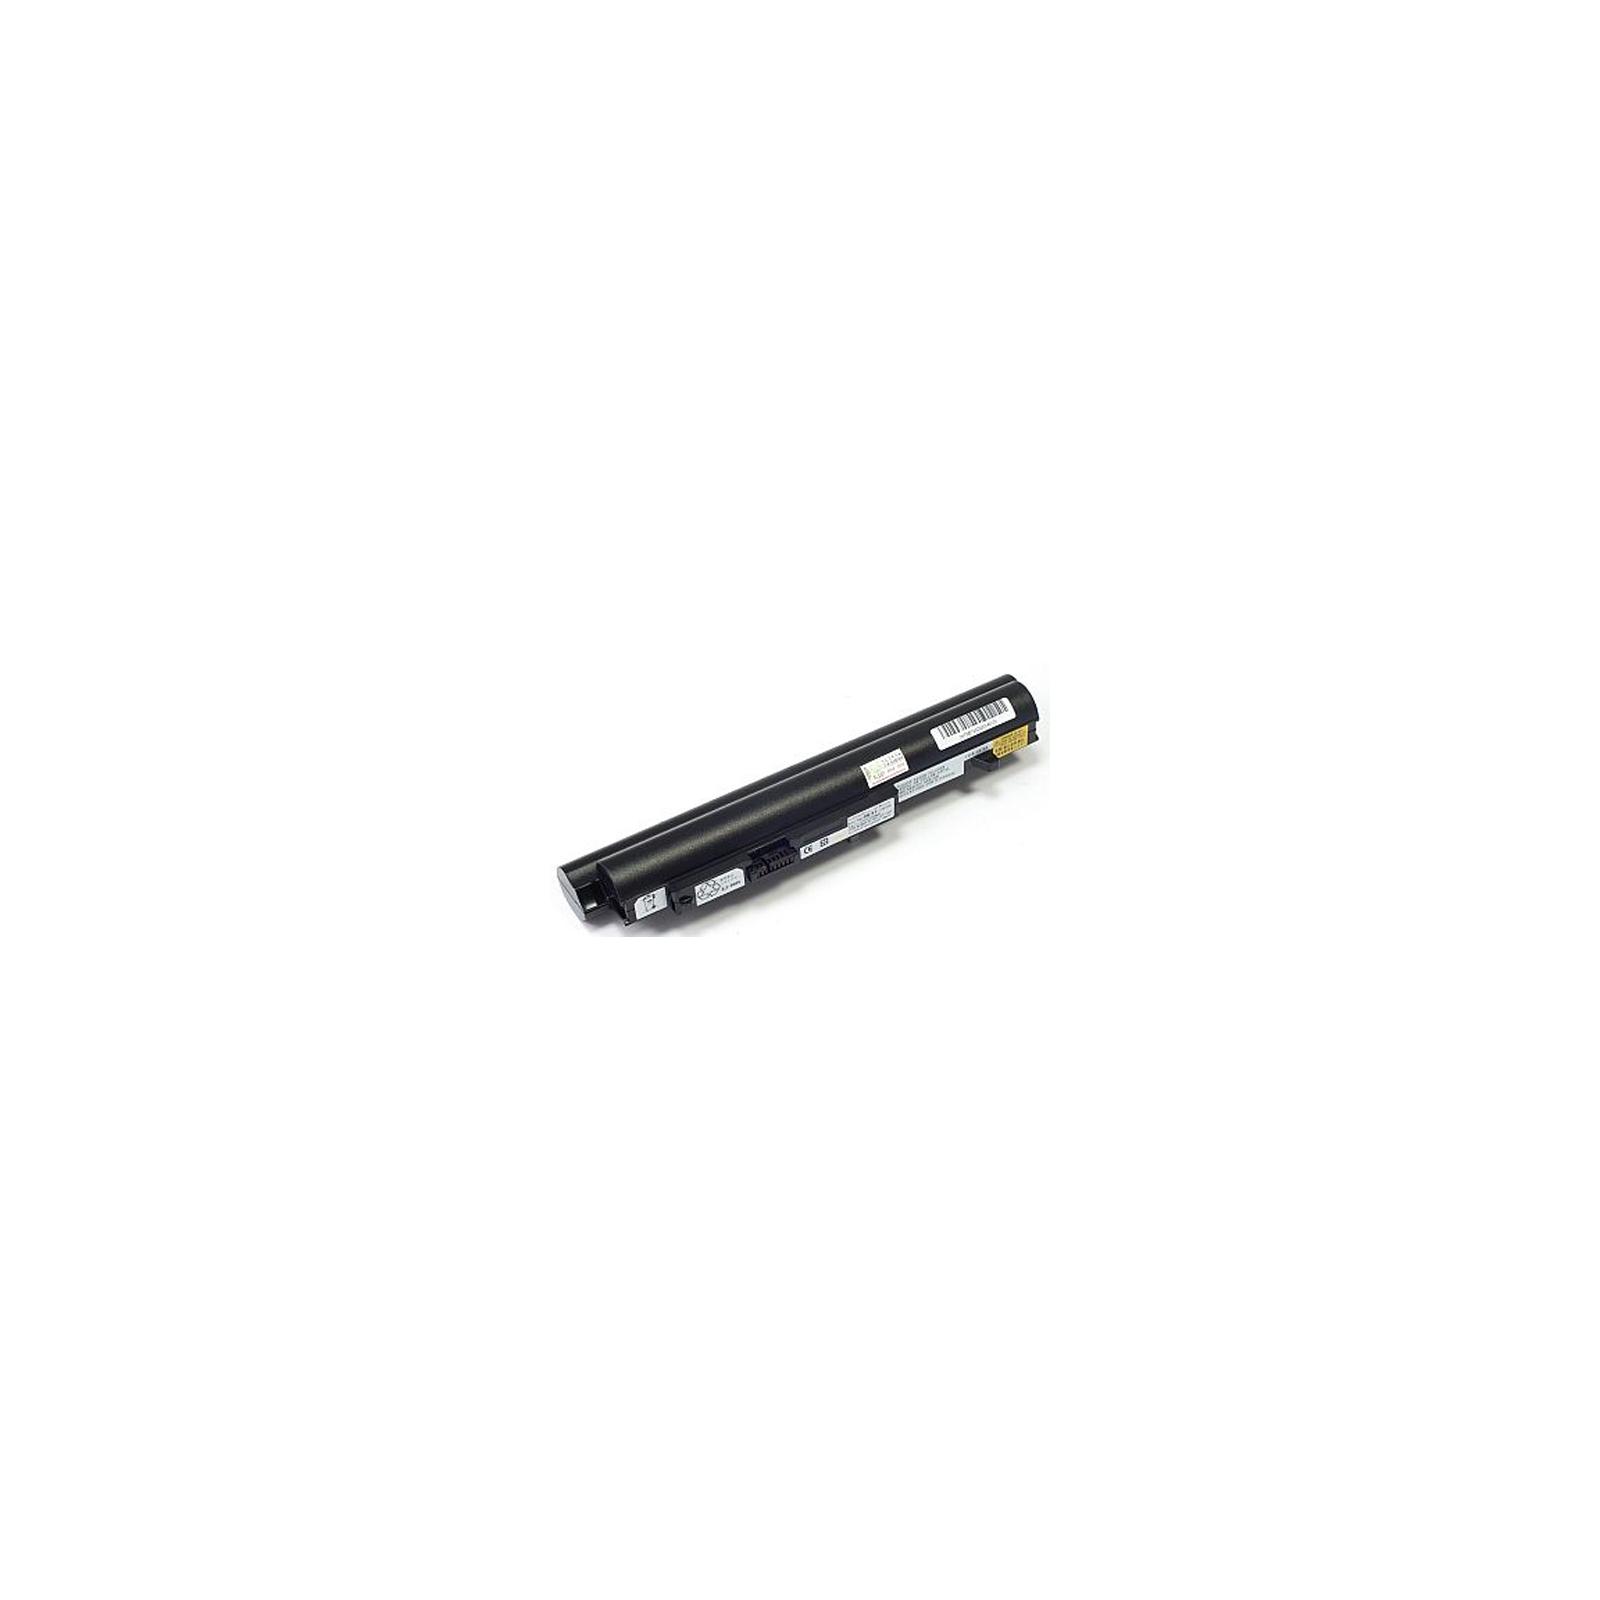 Аккумулятор для ноутбука LENOVO S10-2 (L09C3B11, S10-2) 11.1V 5200mAh PowerPlant (NB00000132)